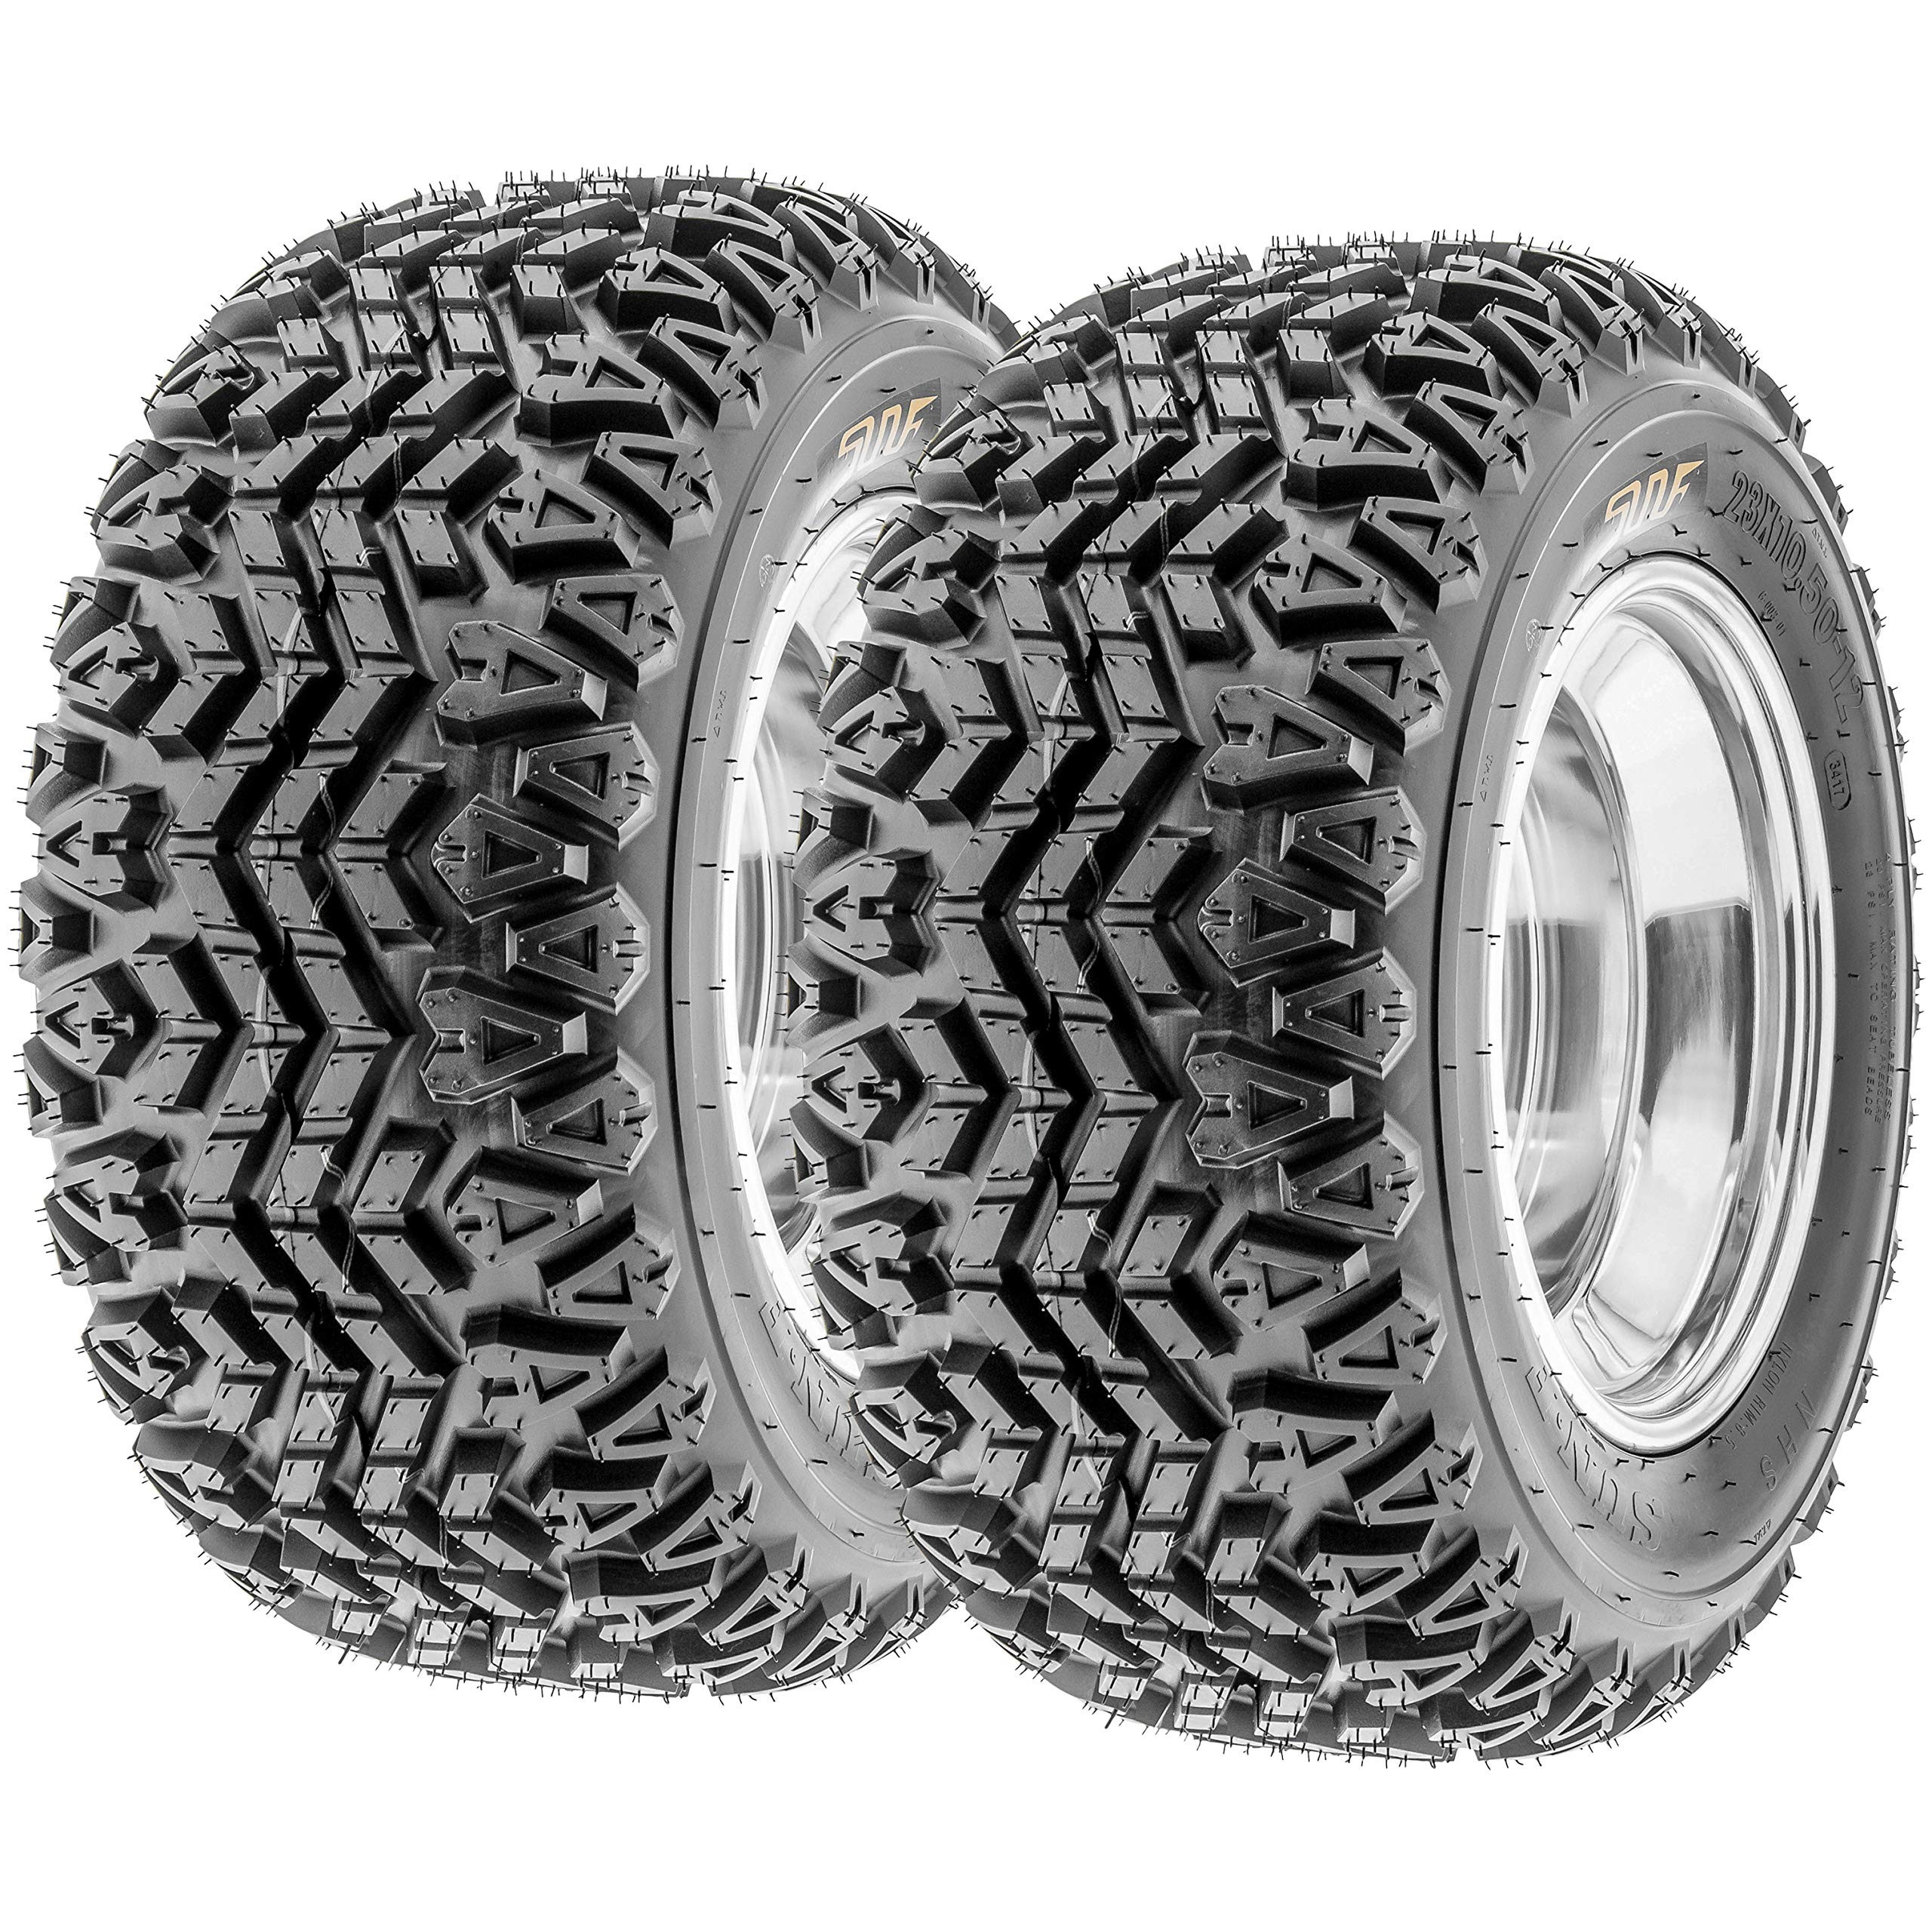 Set of 2 SunF G003 all-Terrain UTV & Golf-Cart Turf Tires 22x11-8, 4 Ply, Tubeless - Lawn & Garden by SunF